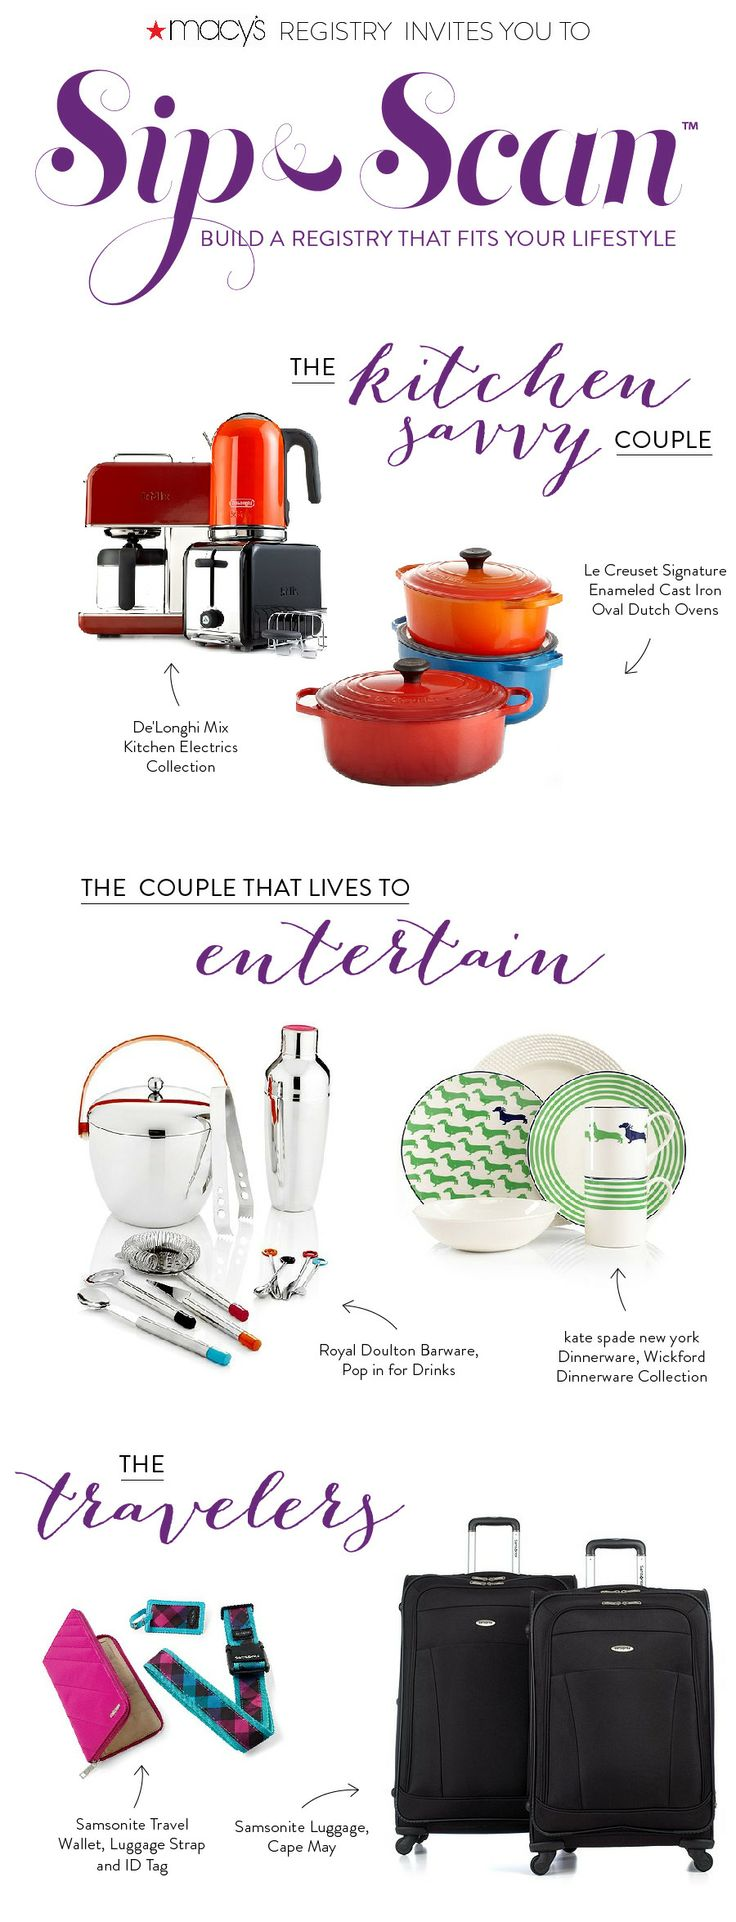 Macys Kitchen Appliances 24 Best Images About Macys Wedding Gift Registry On Pinterest